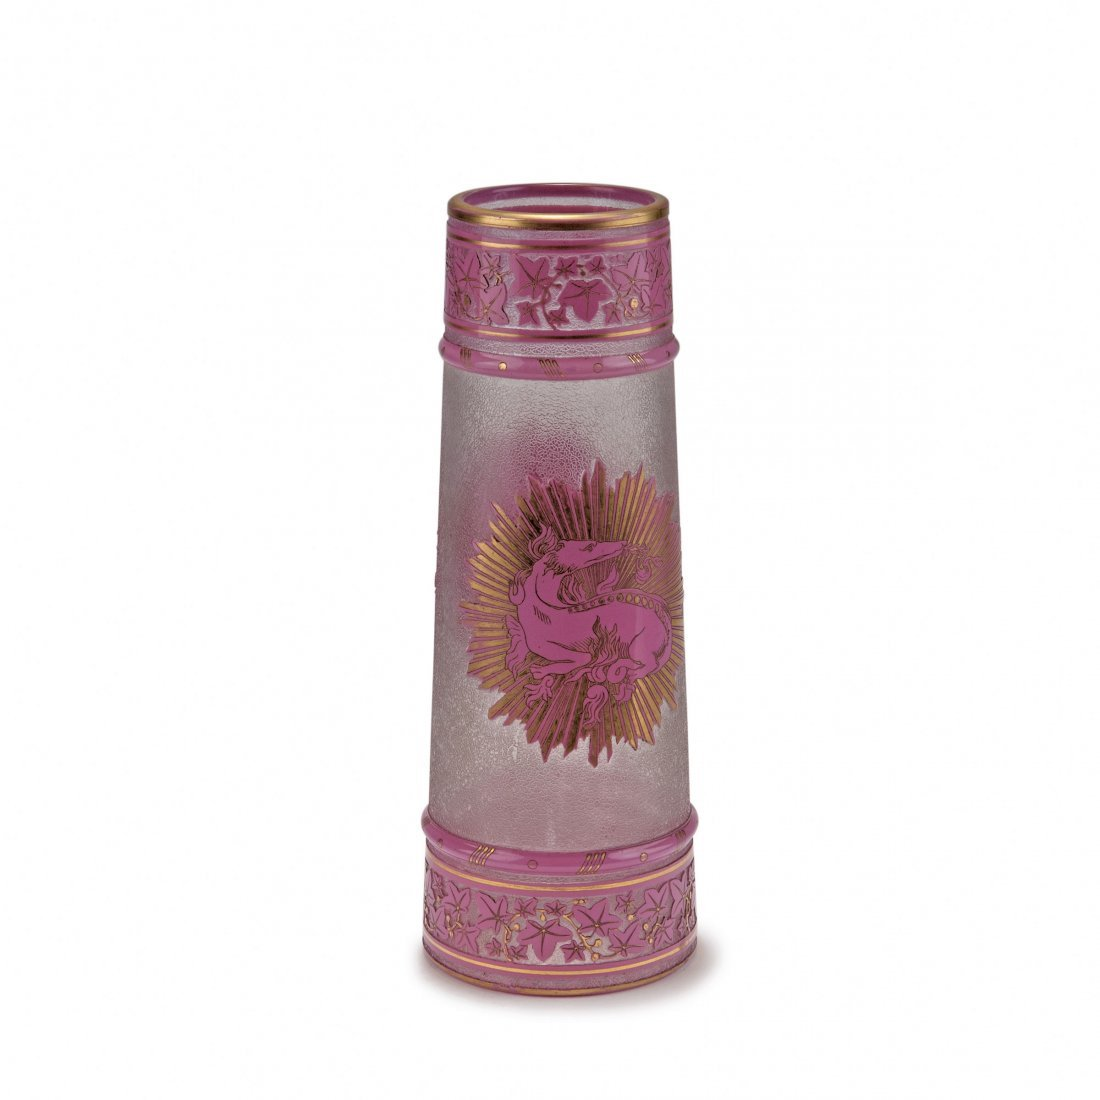 Vase with dragons, c1900